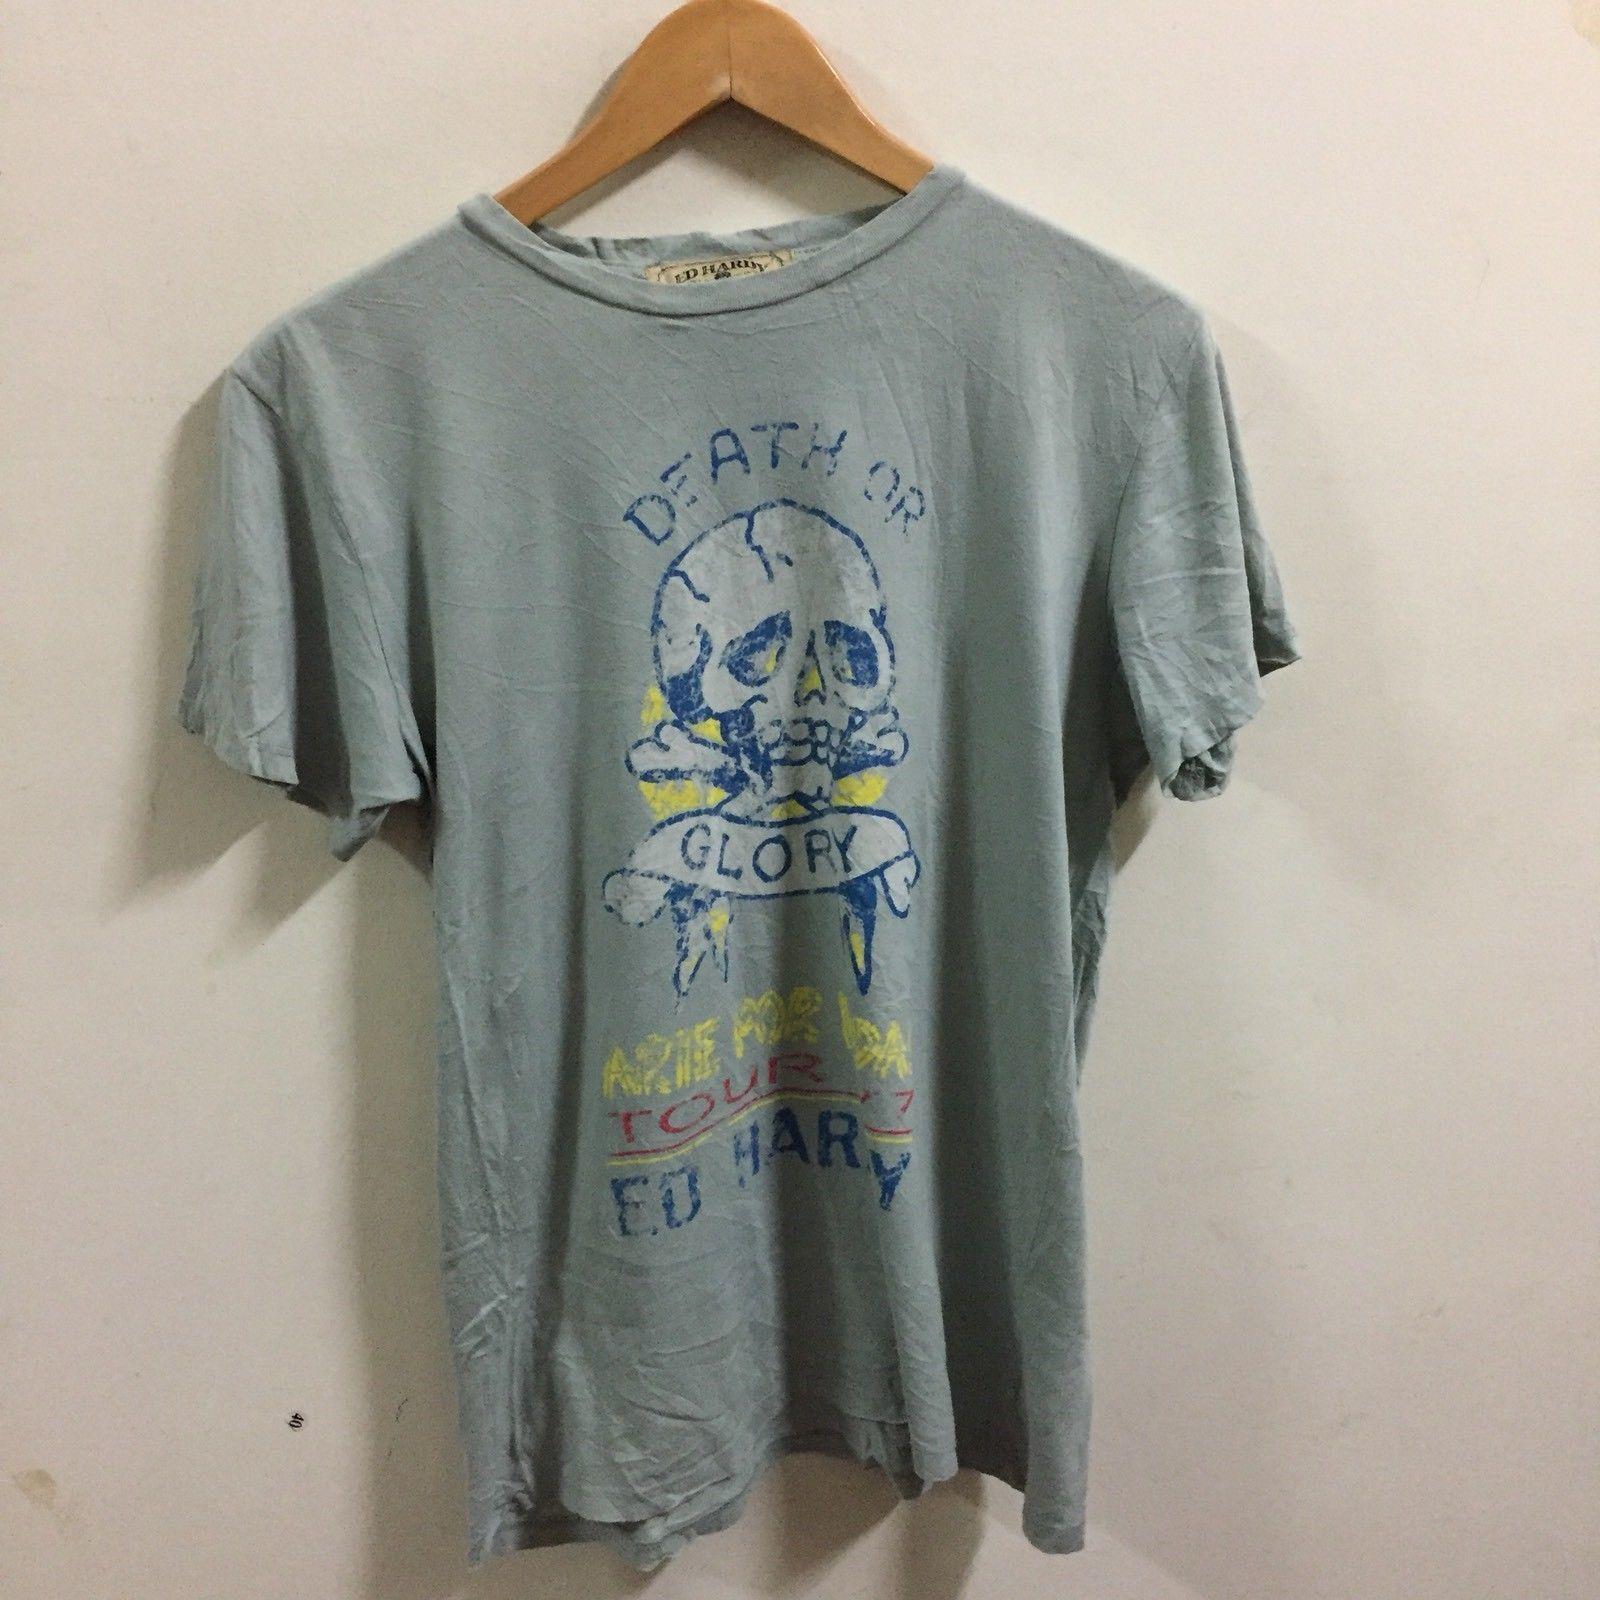 0ae35331 ED HARDY Christian Audigier Mens S T-Shirt and 50 similar items